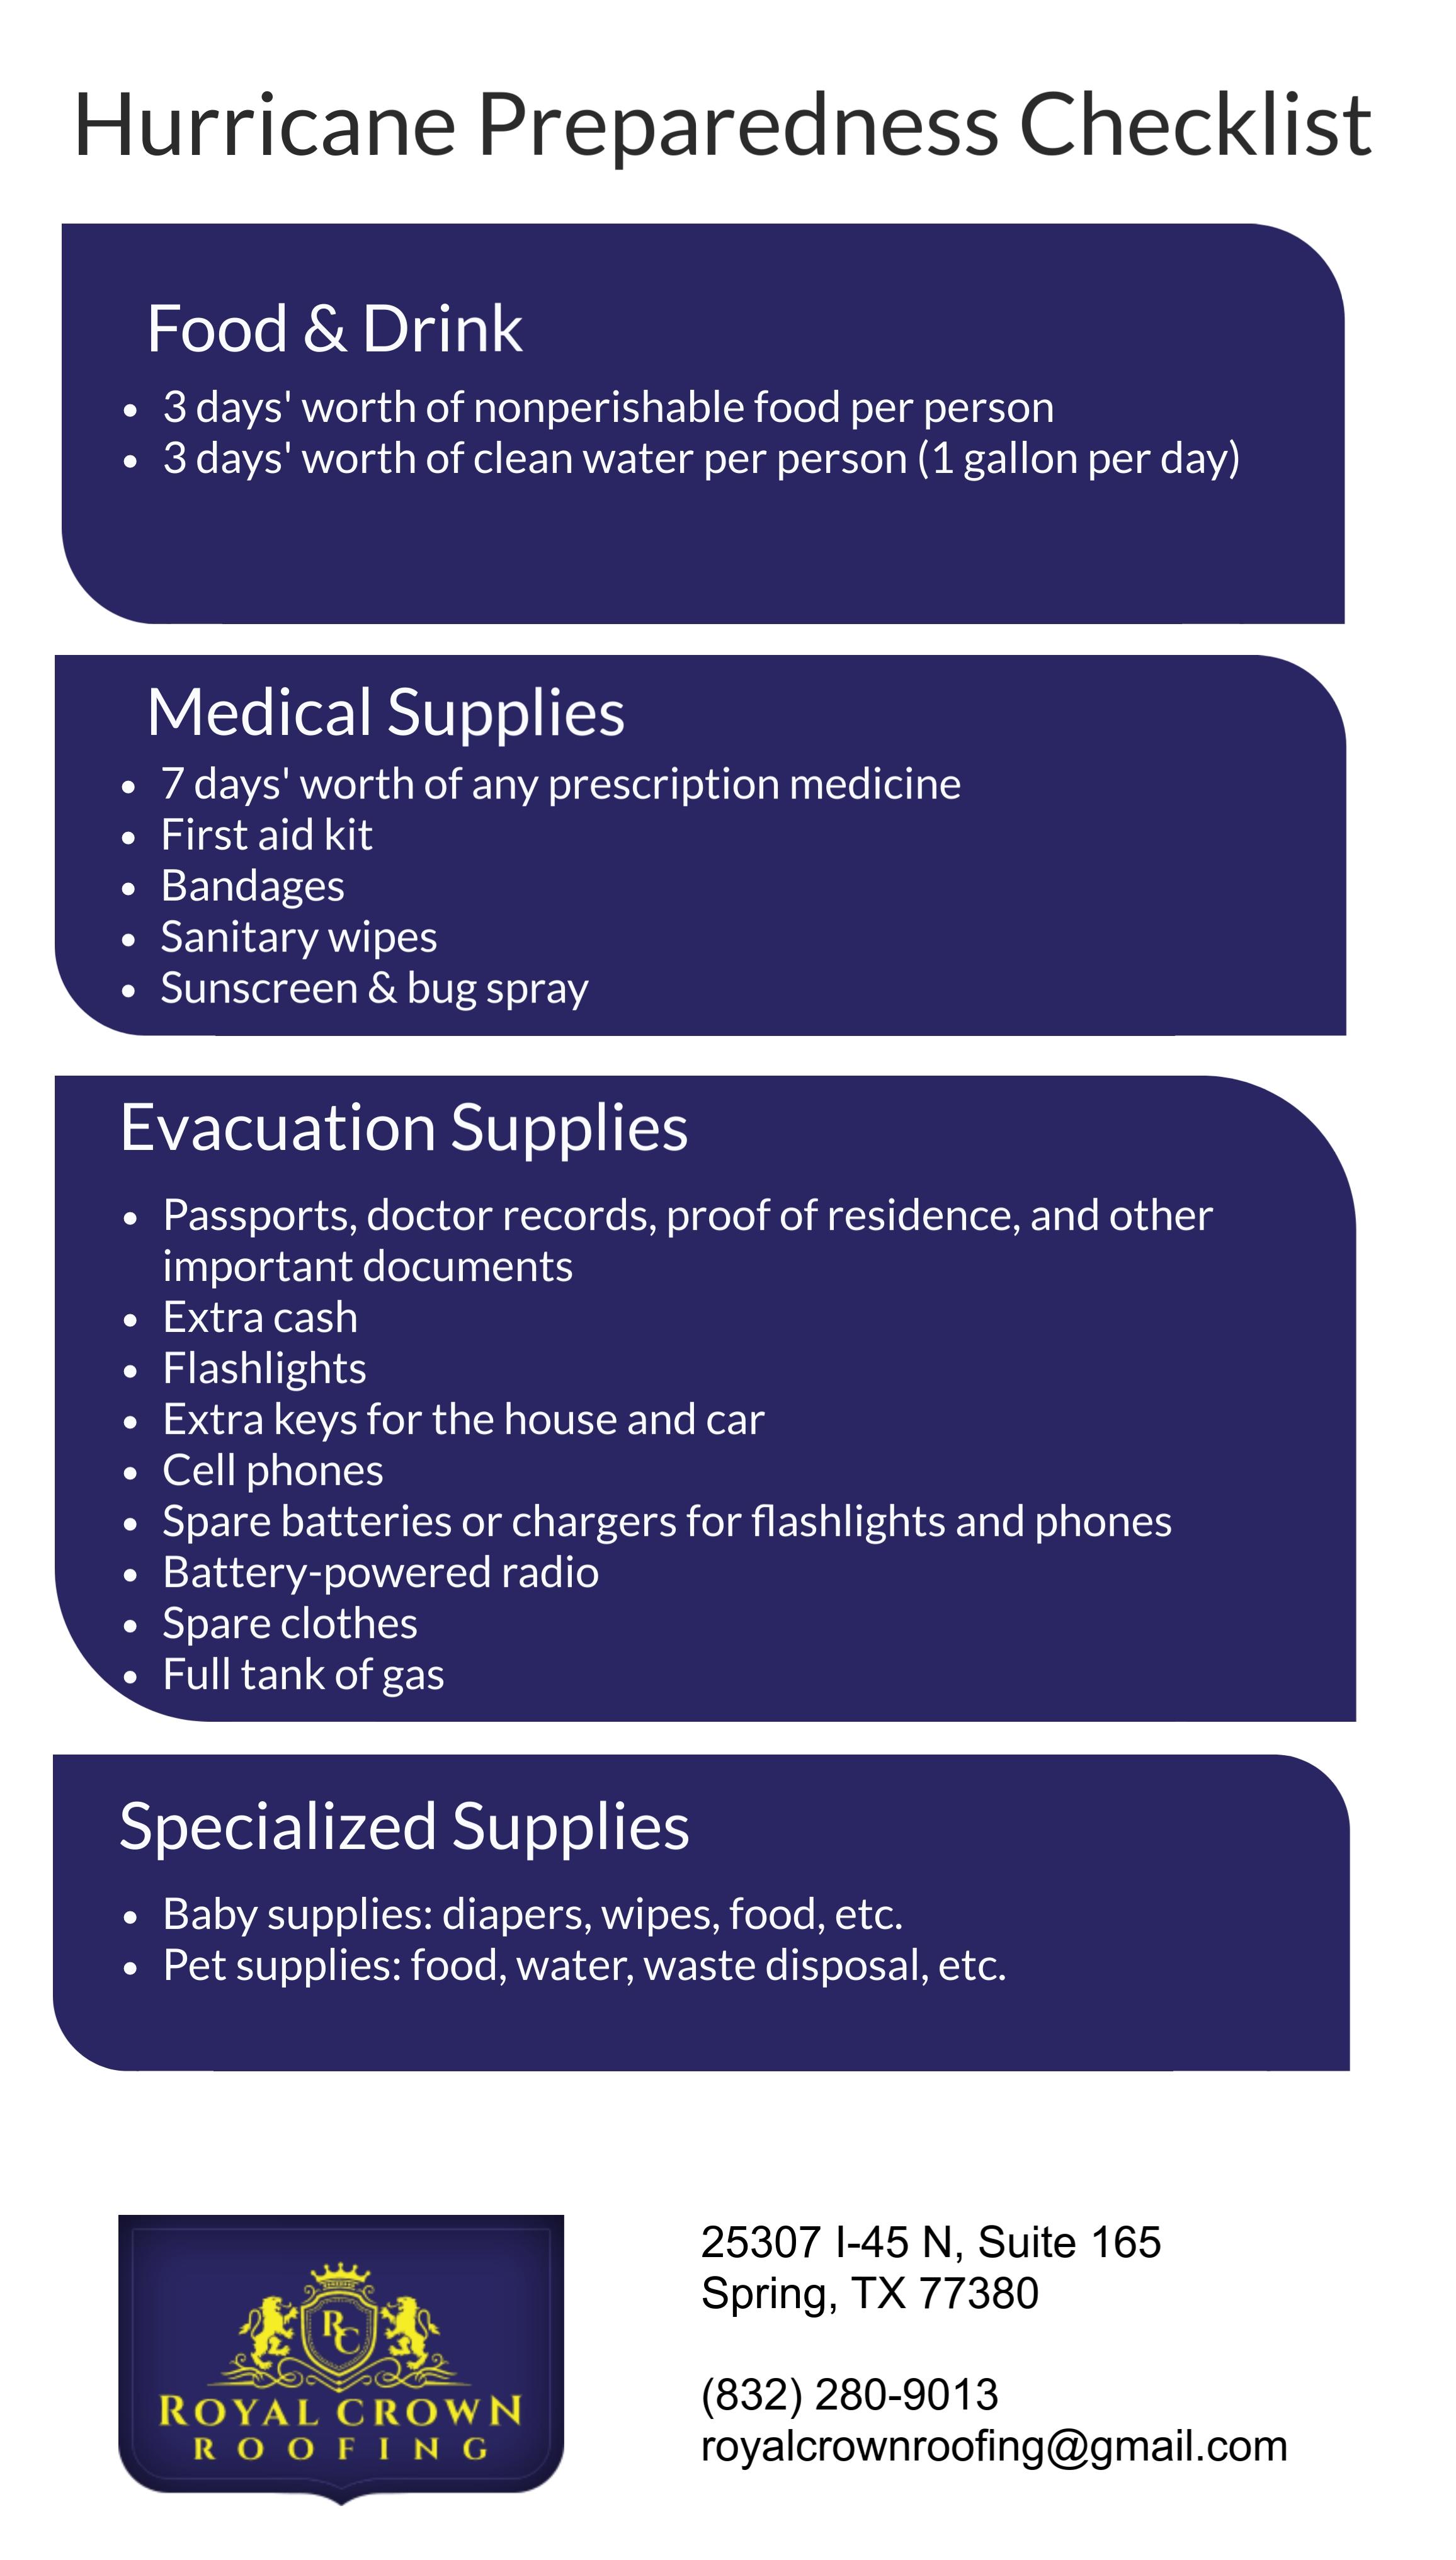 Hurricane Preparedness: The Essential Checklist, Royal Crown Roofing, Conroe, TX